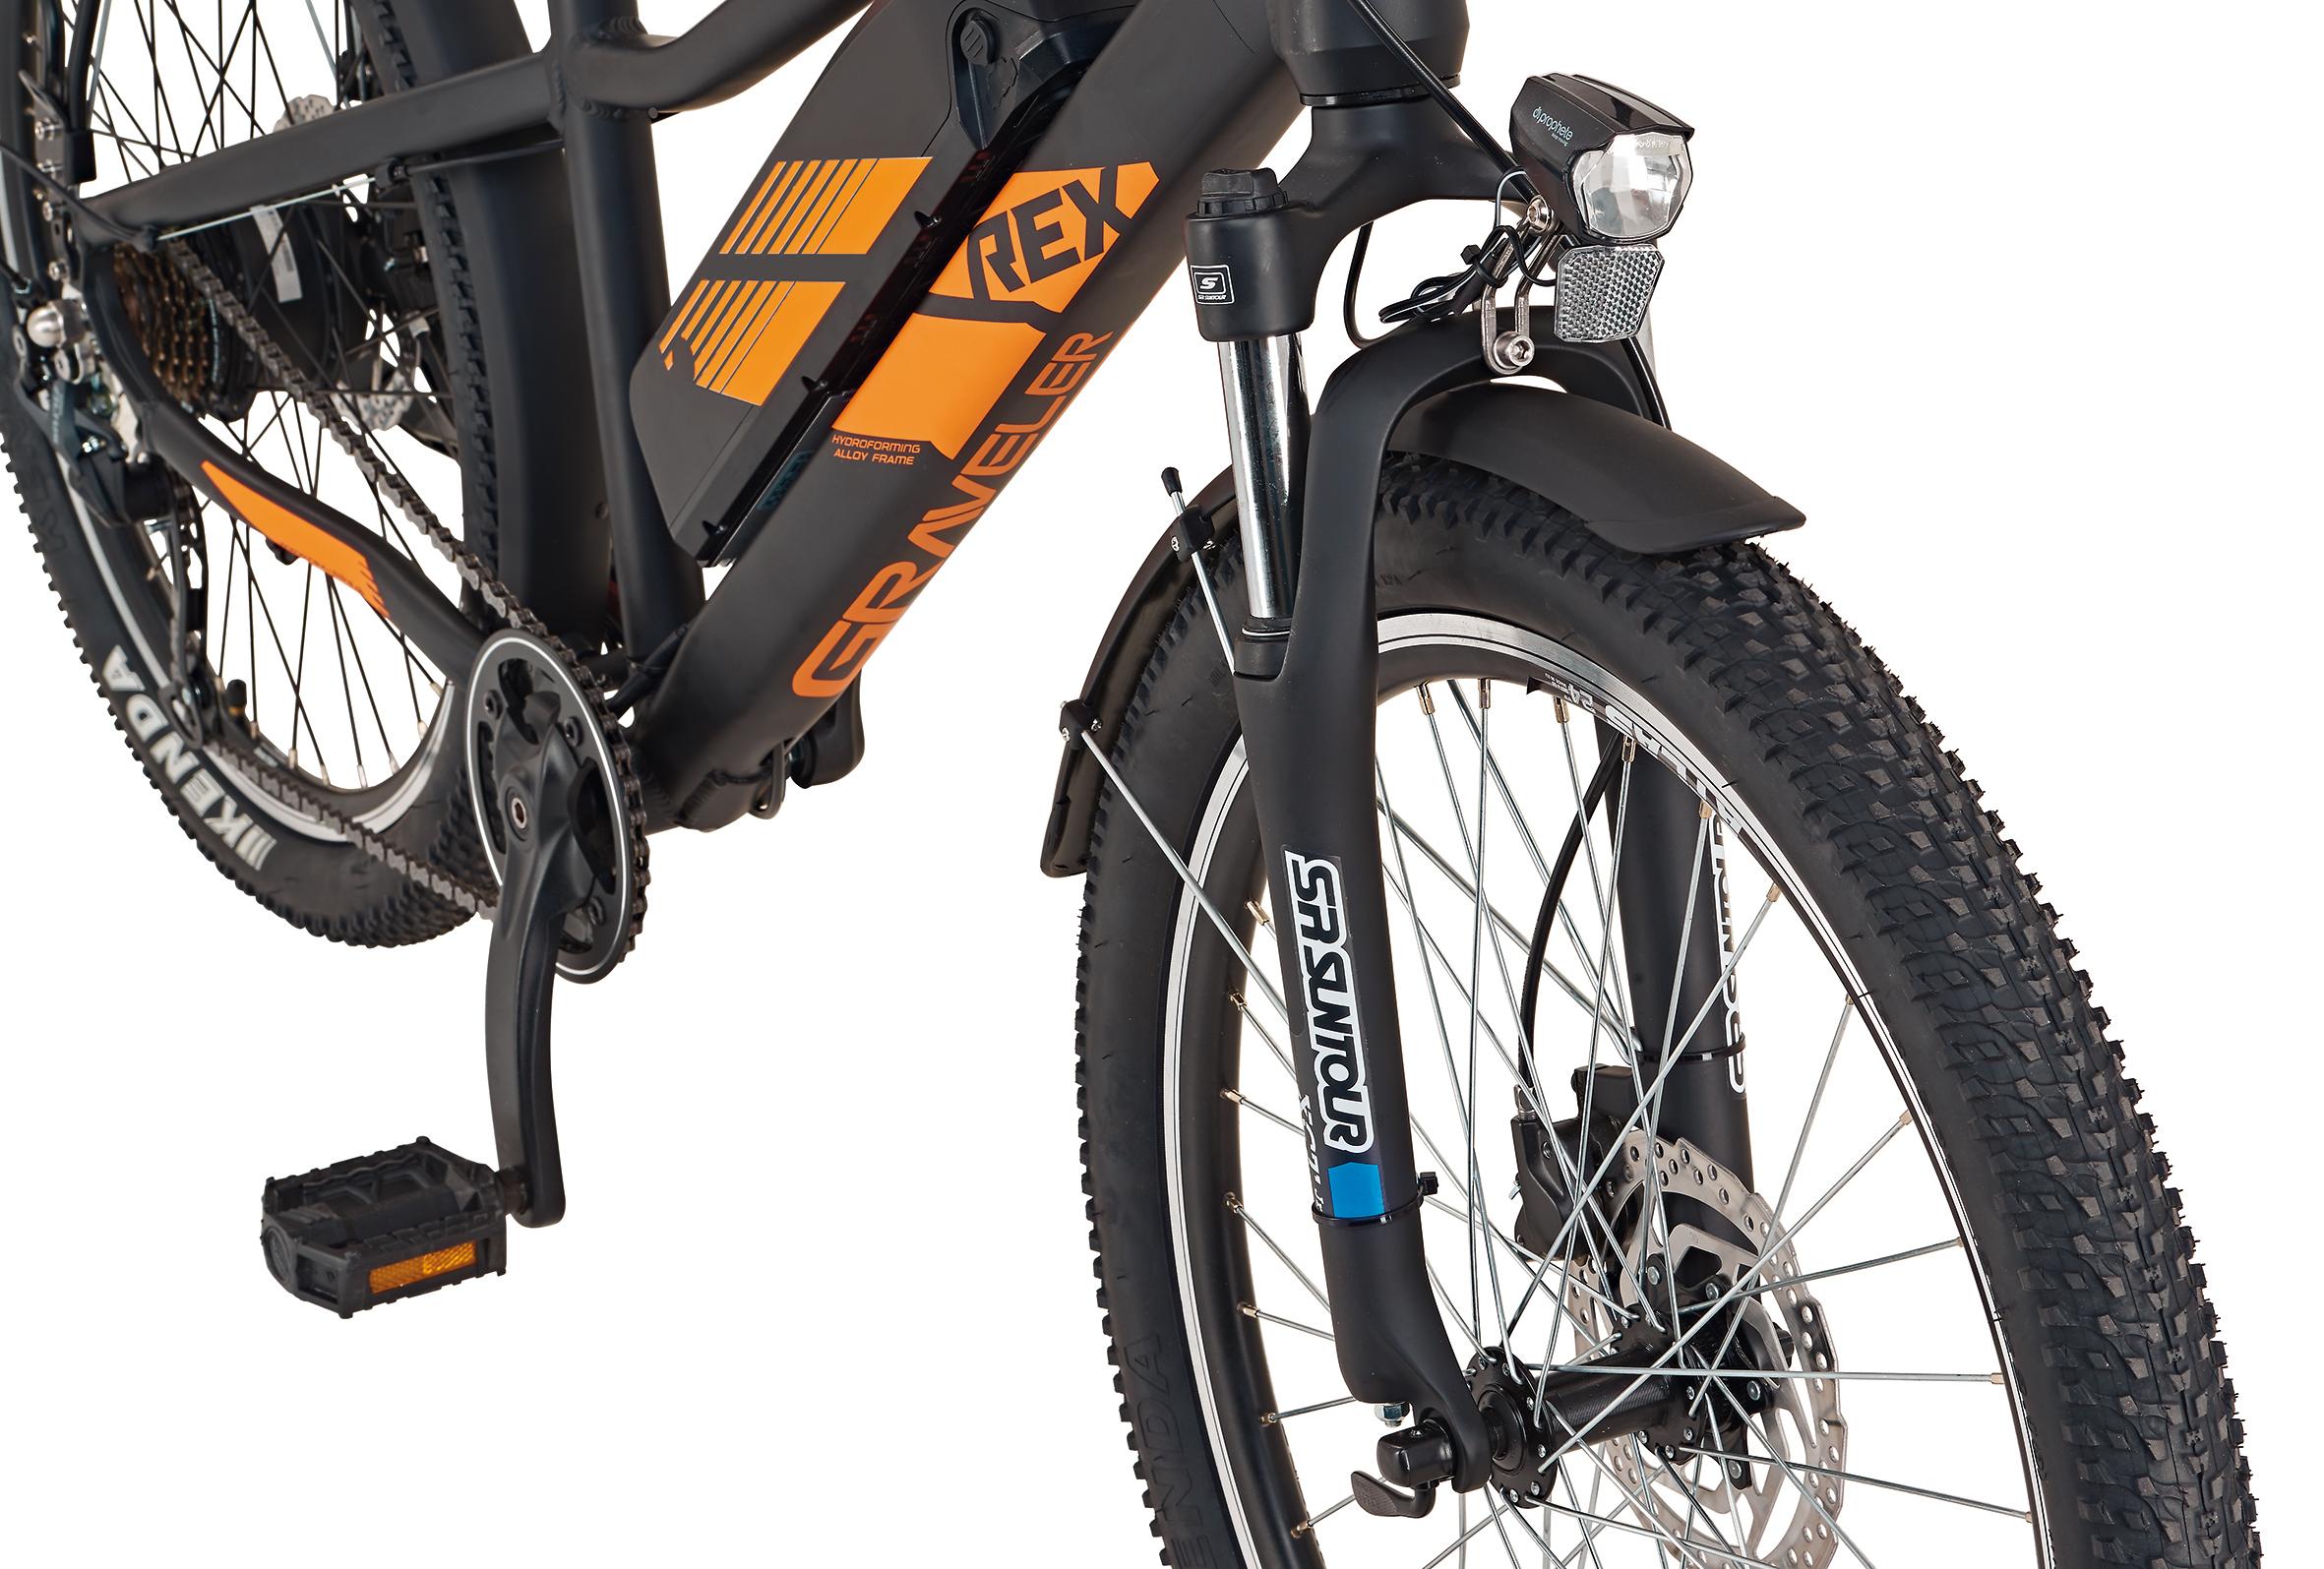 "Rex Bike Jugend Elektrofahrrad / E-All Terrain Bike Graveler Kids 24"" Bild 4"